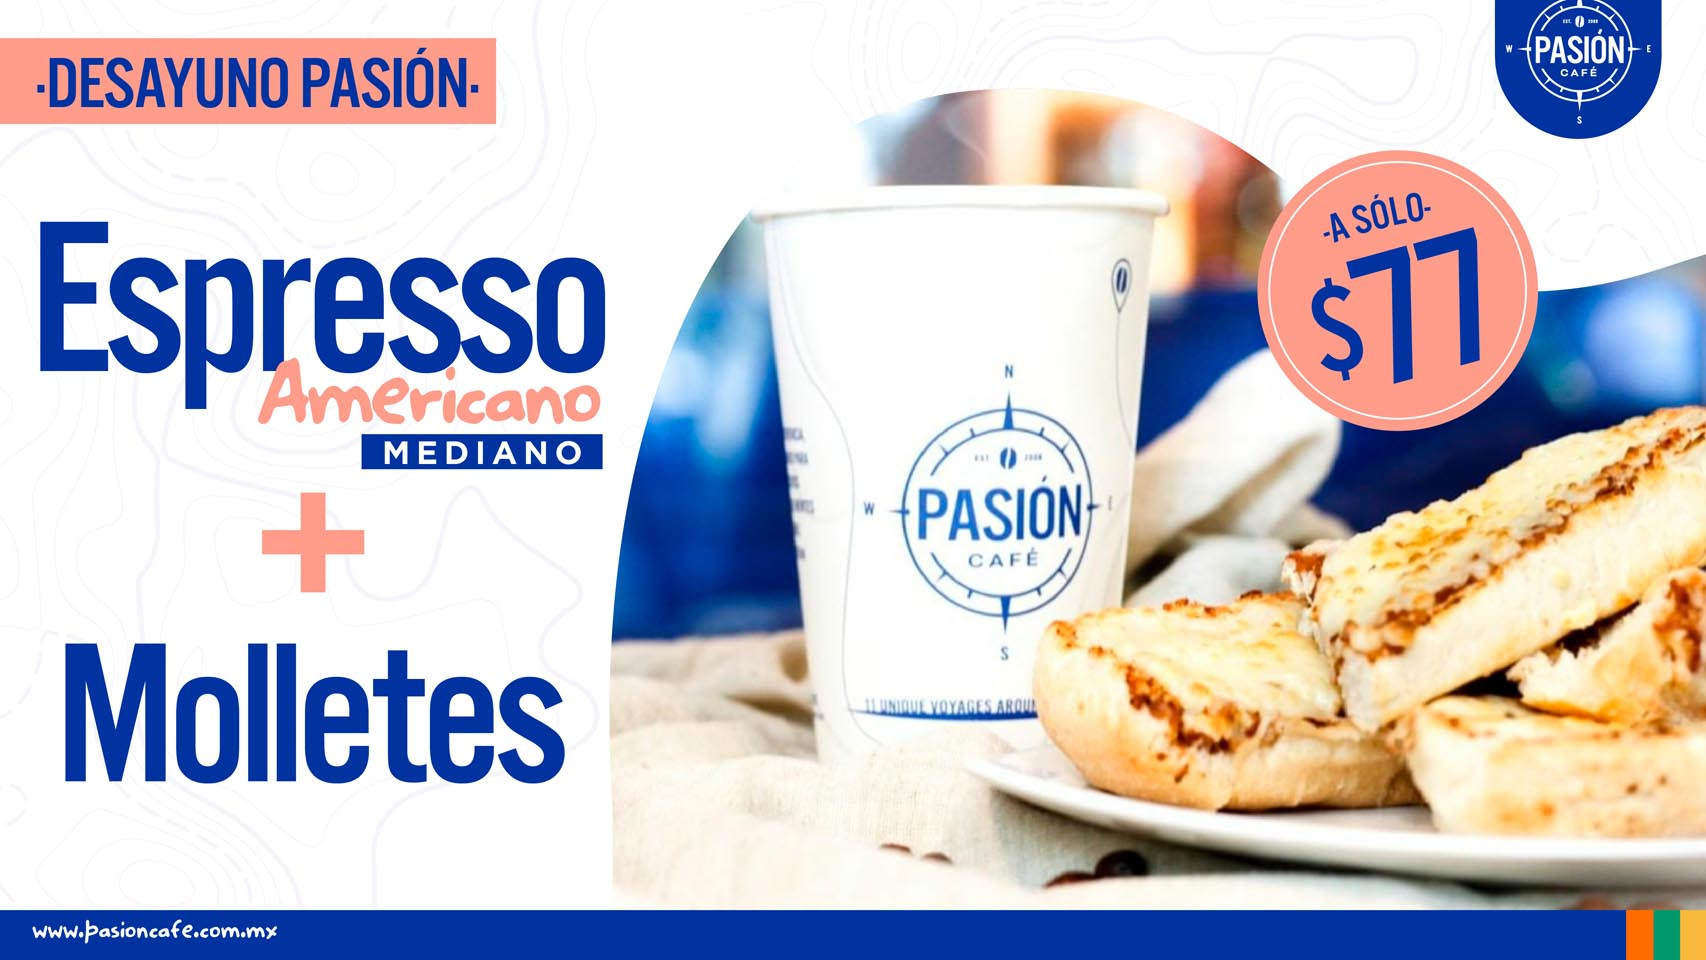 PASION3